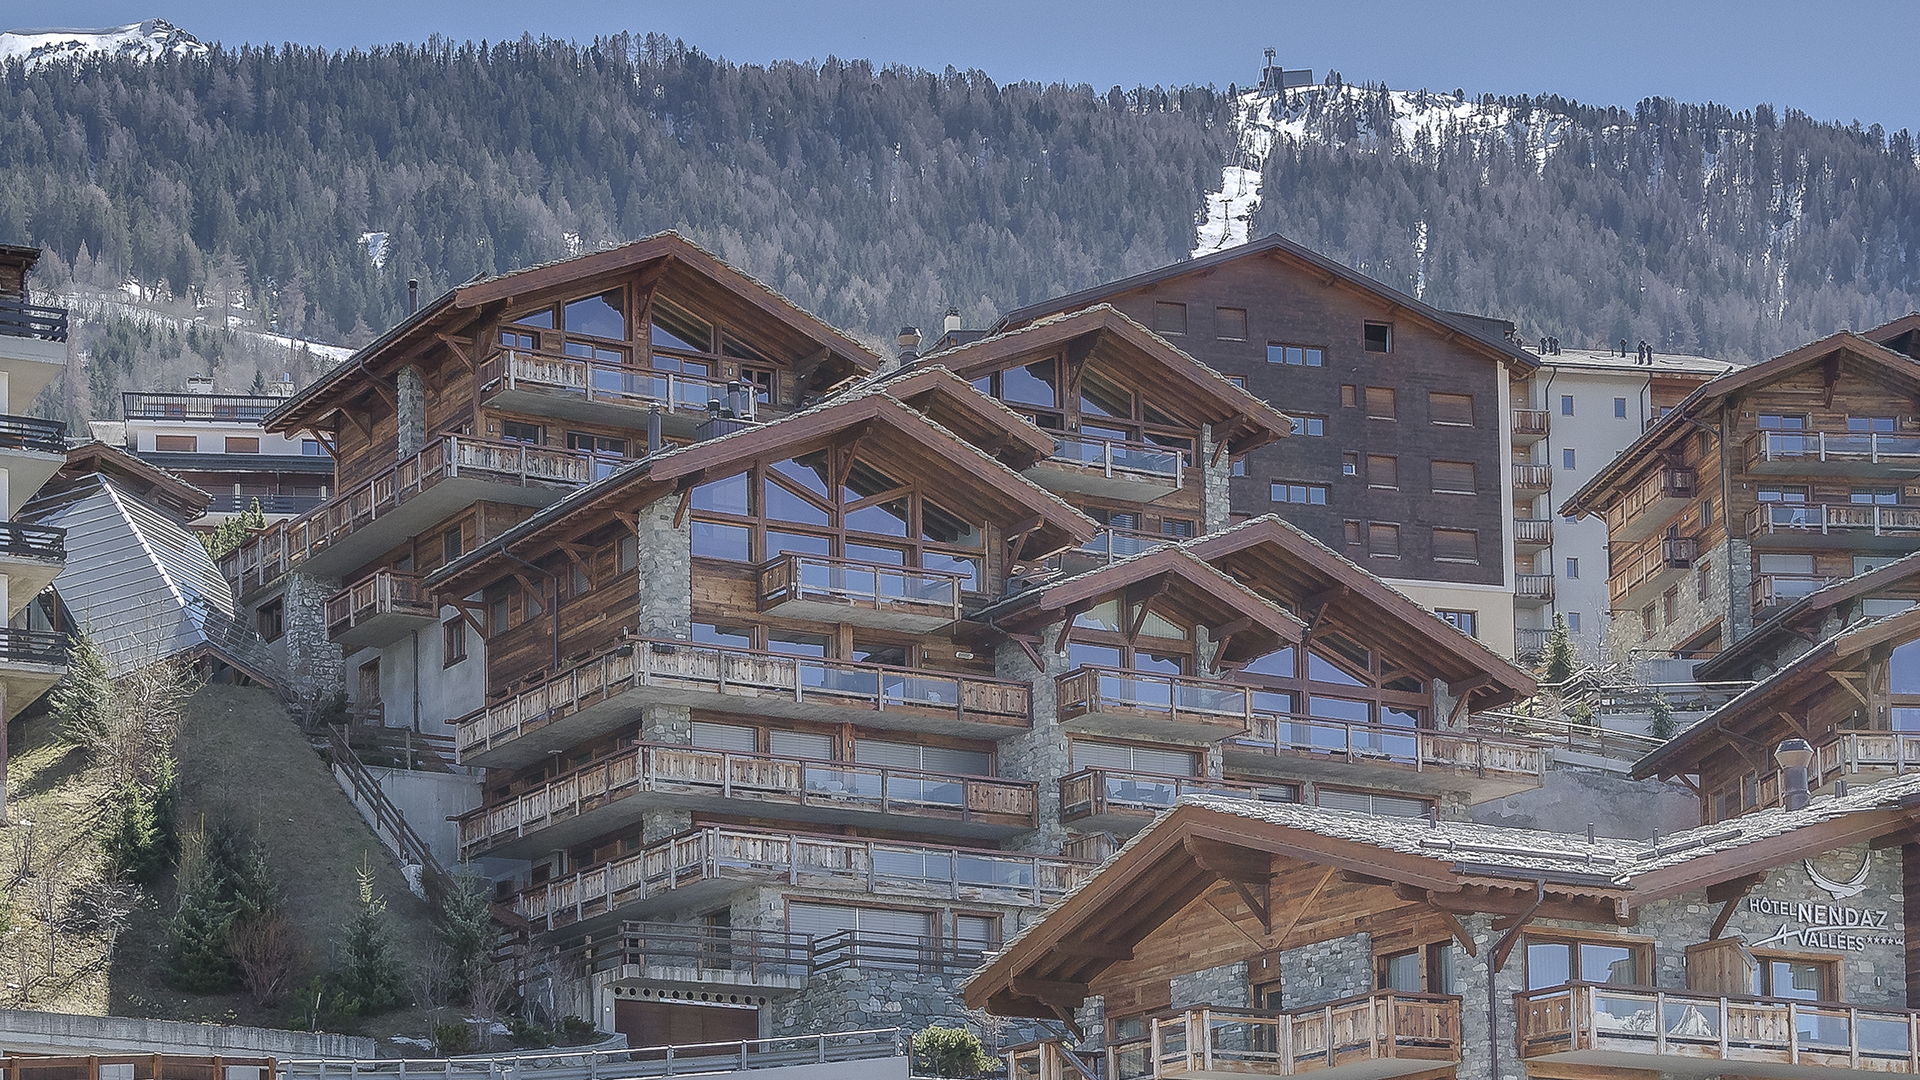 4 Vallees Apt. Apartments, Switzerland